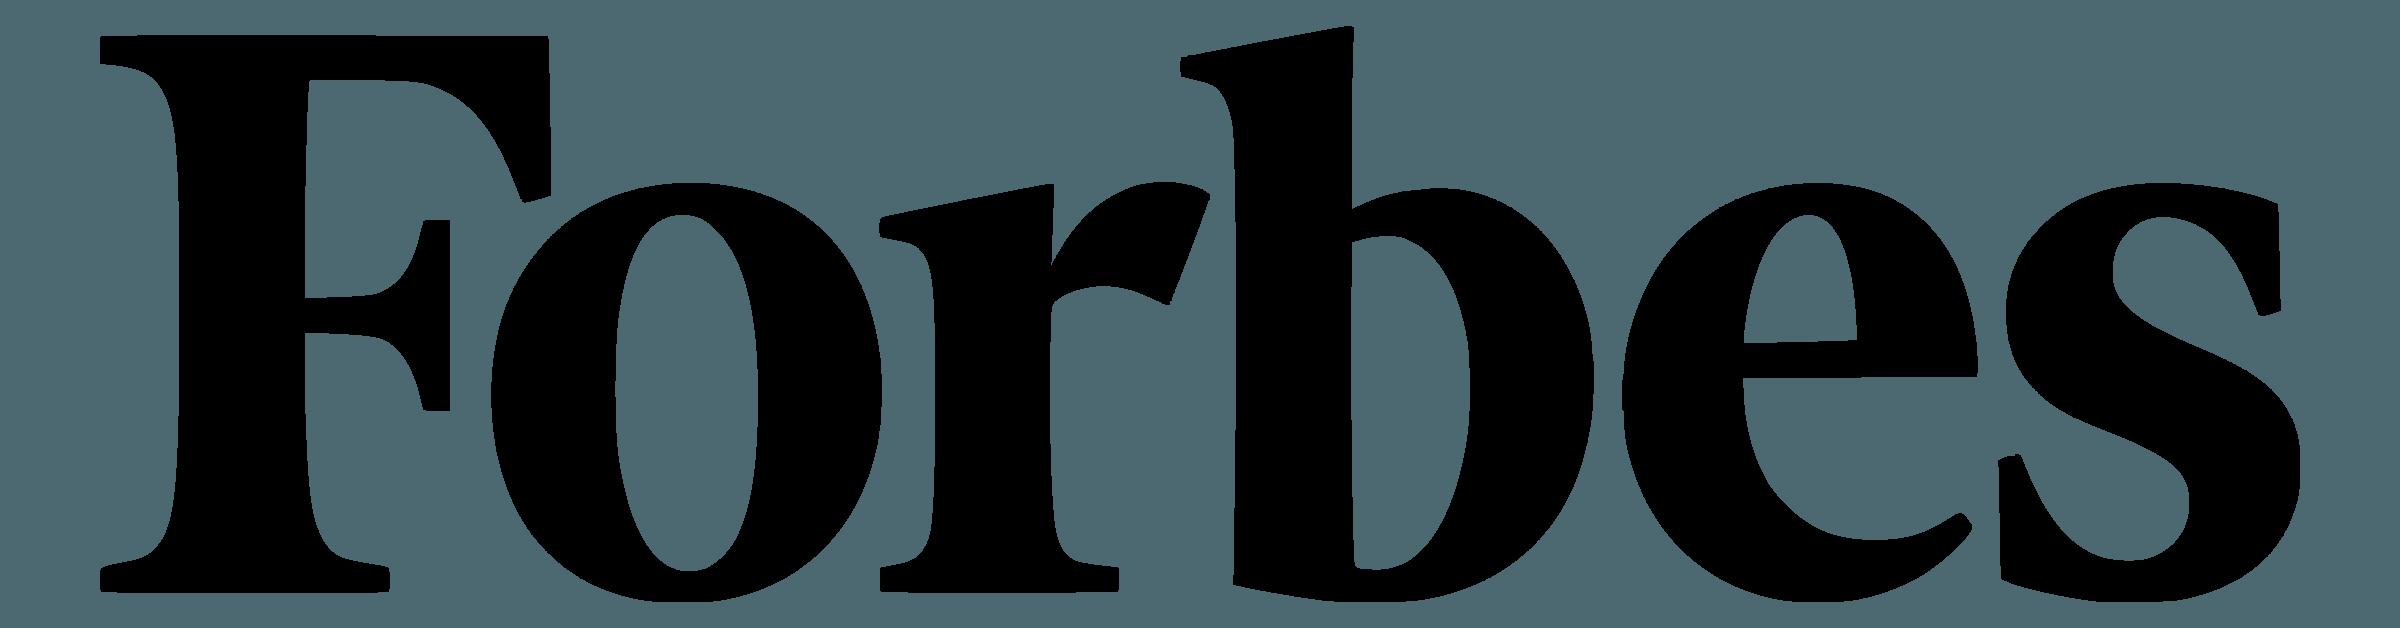 https://wordplayagency.com/wp-content/uploads/2019/03/forbes-logo.png